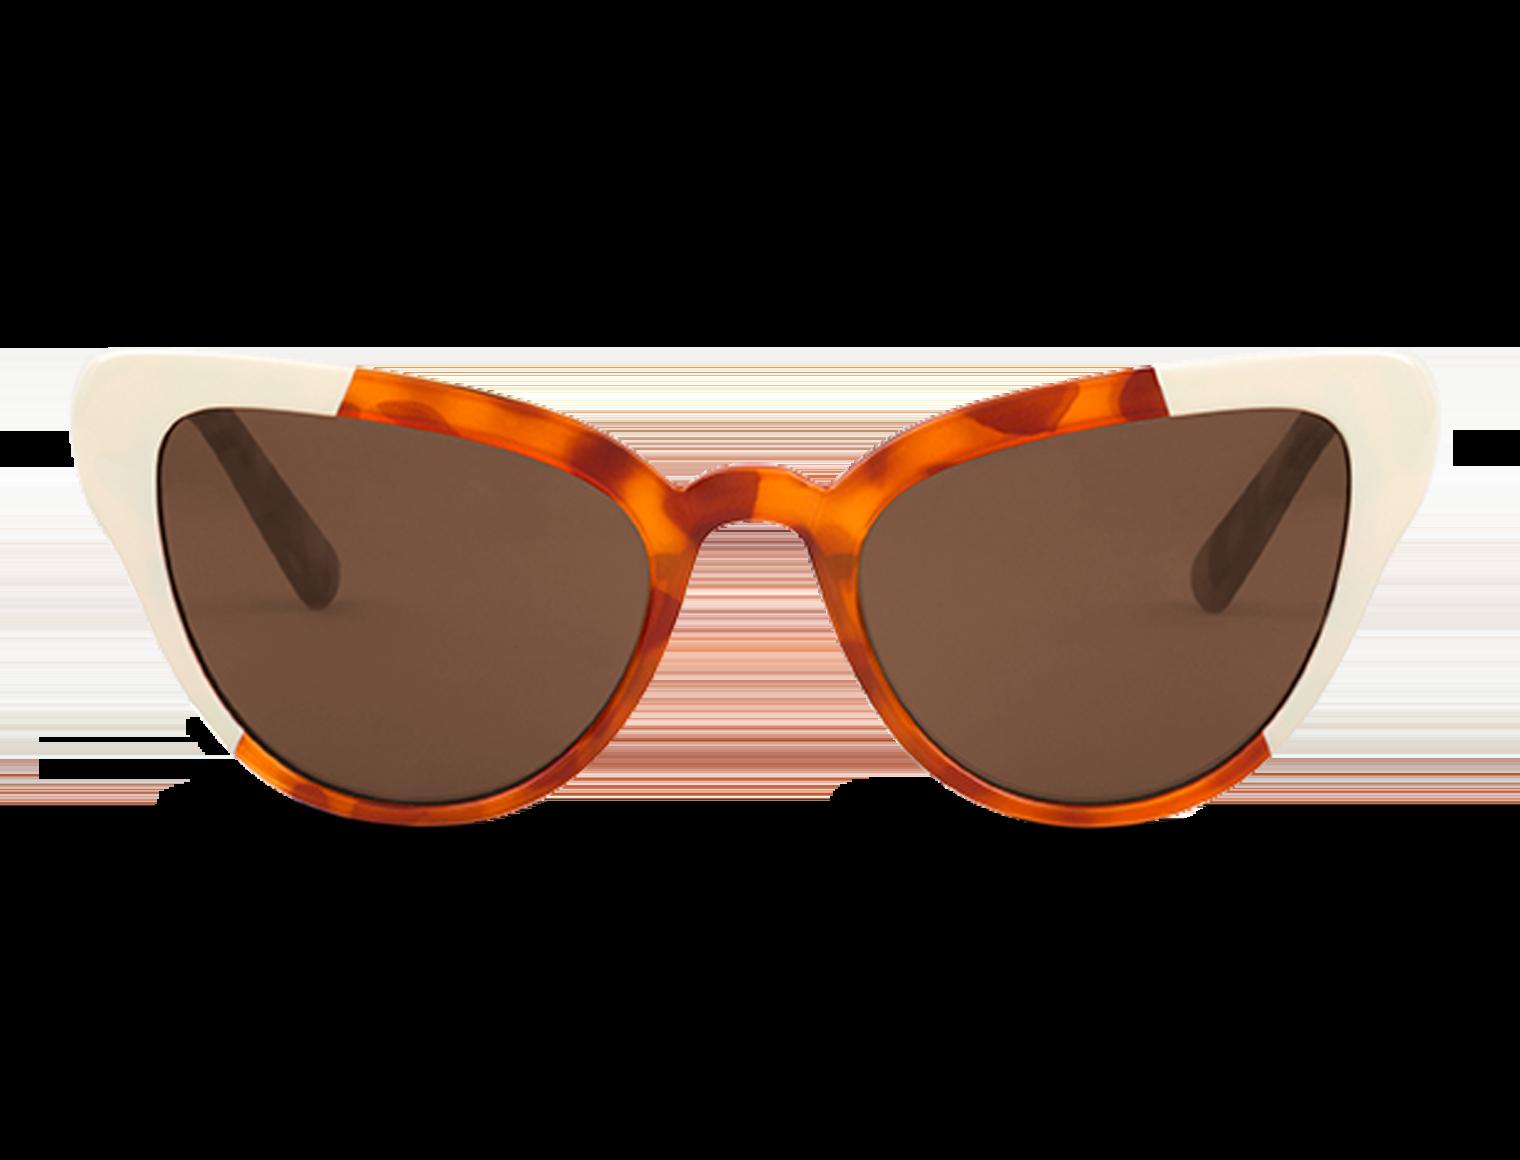 VESTERBRO  | CREAM/LEO TORTOISE with classical lenses